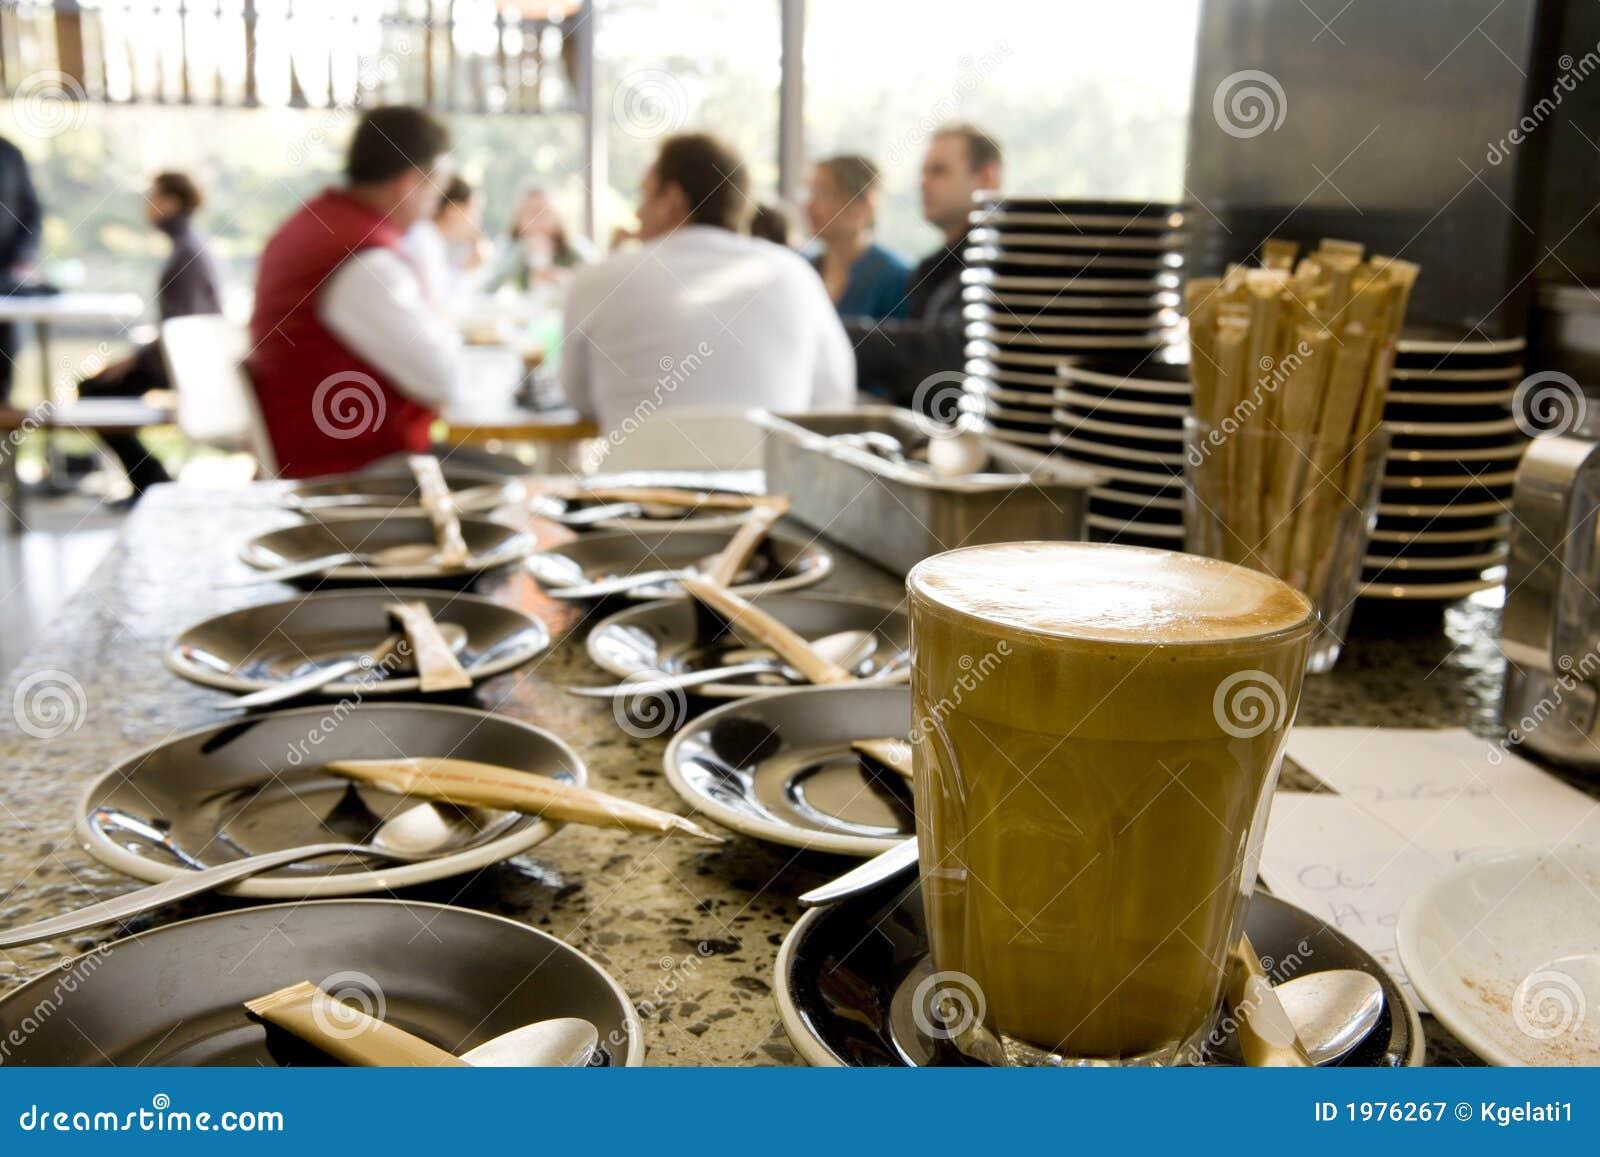 Tazza e piattino di caffè al caffè